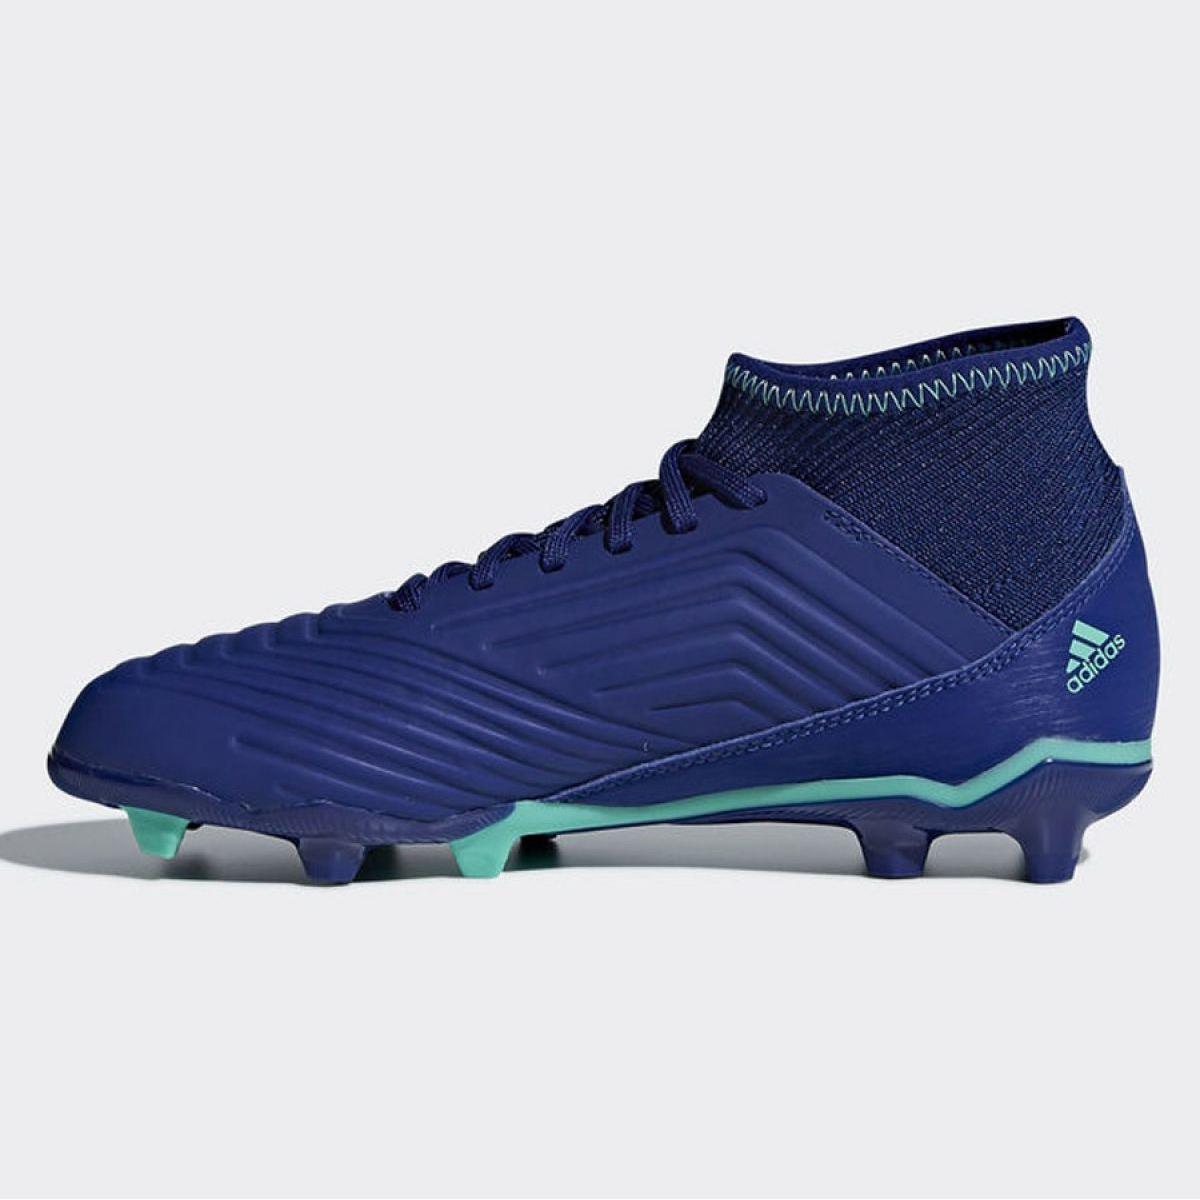 3 Predator De Chaussures Foot Cp9012 18 Fg Adidas Junior kXliuOPZwT